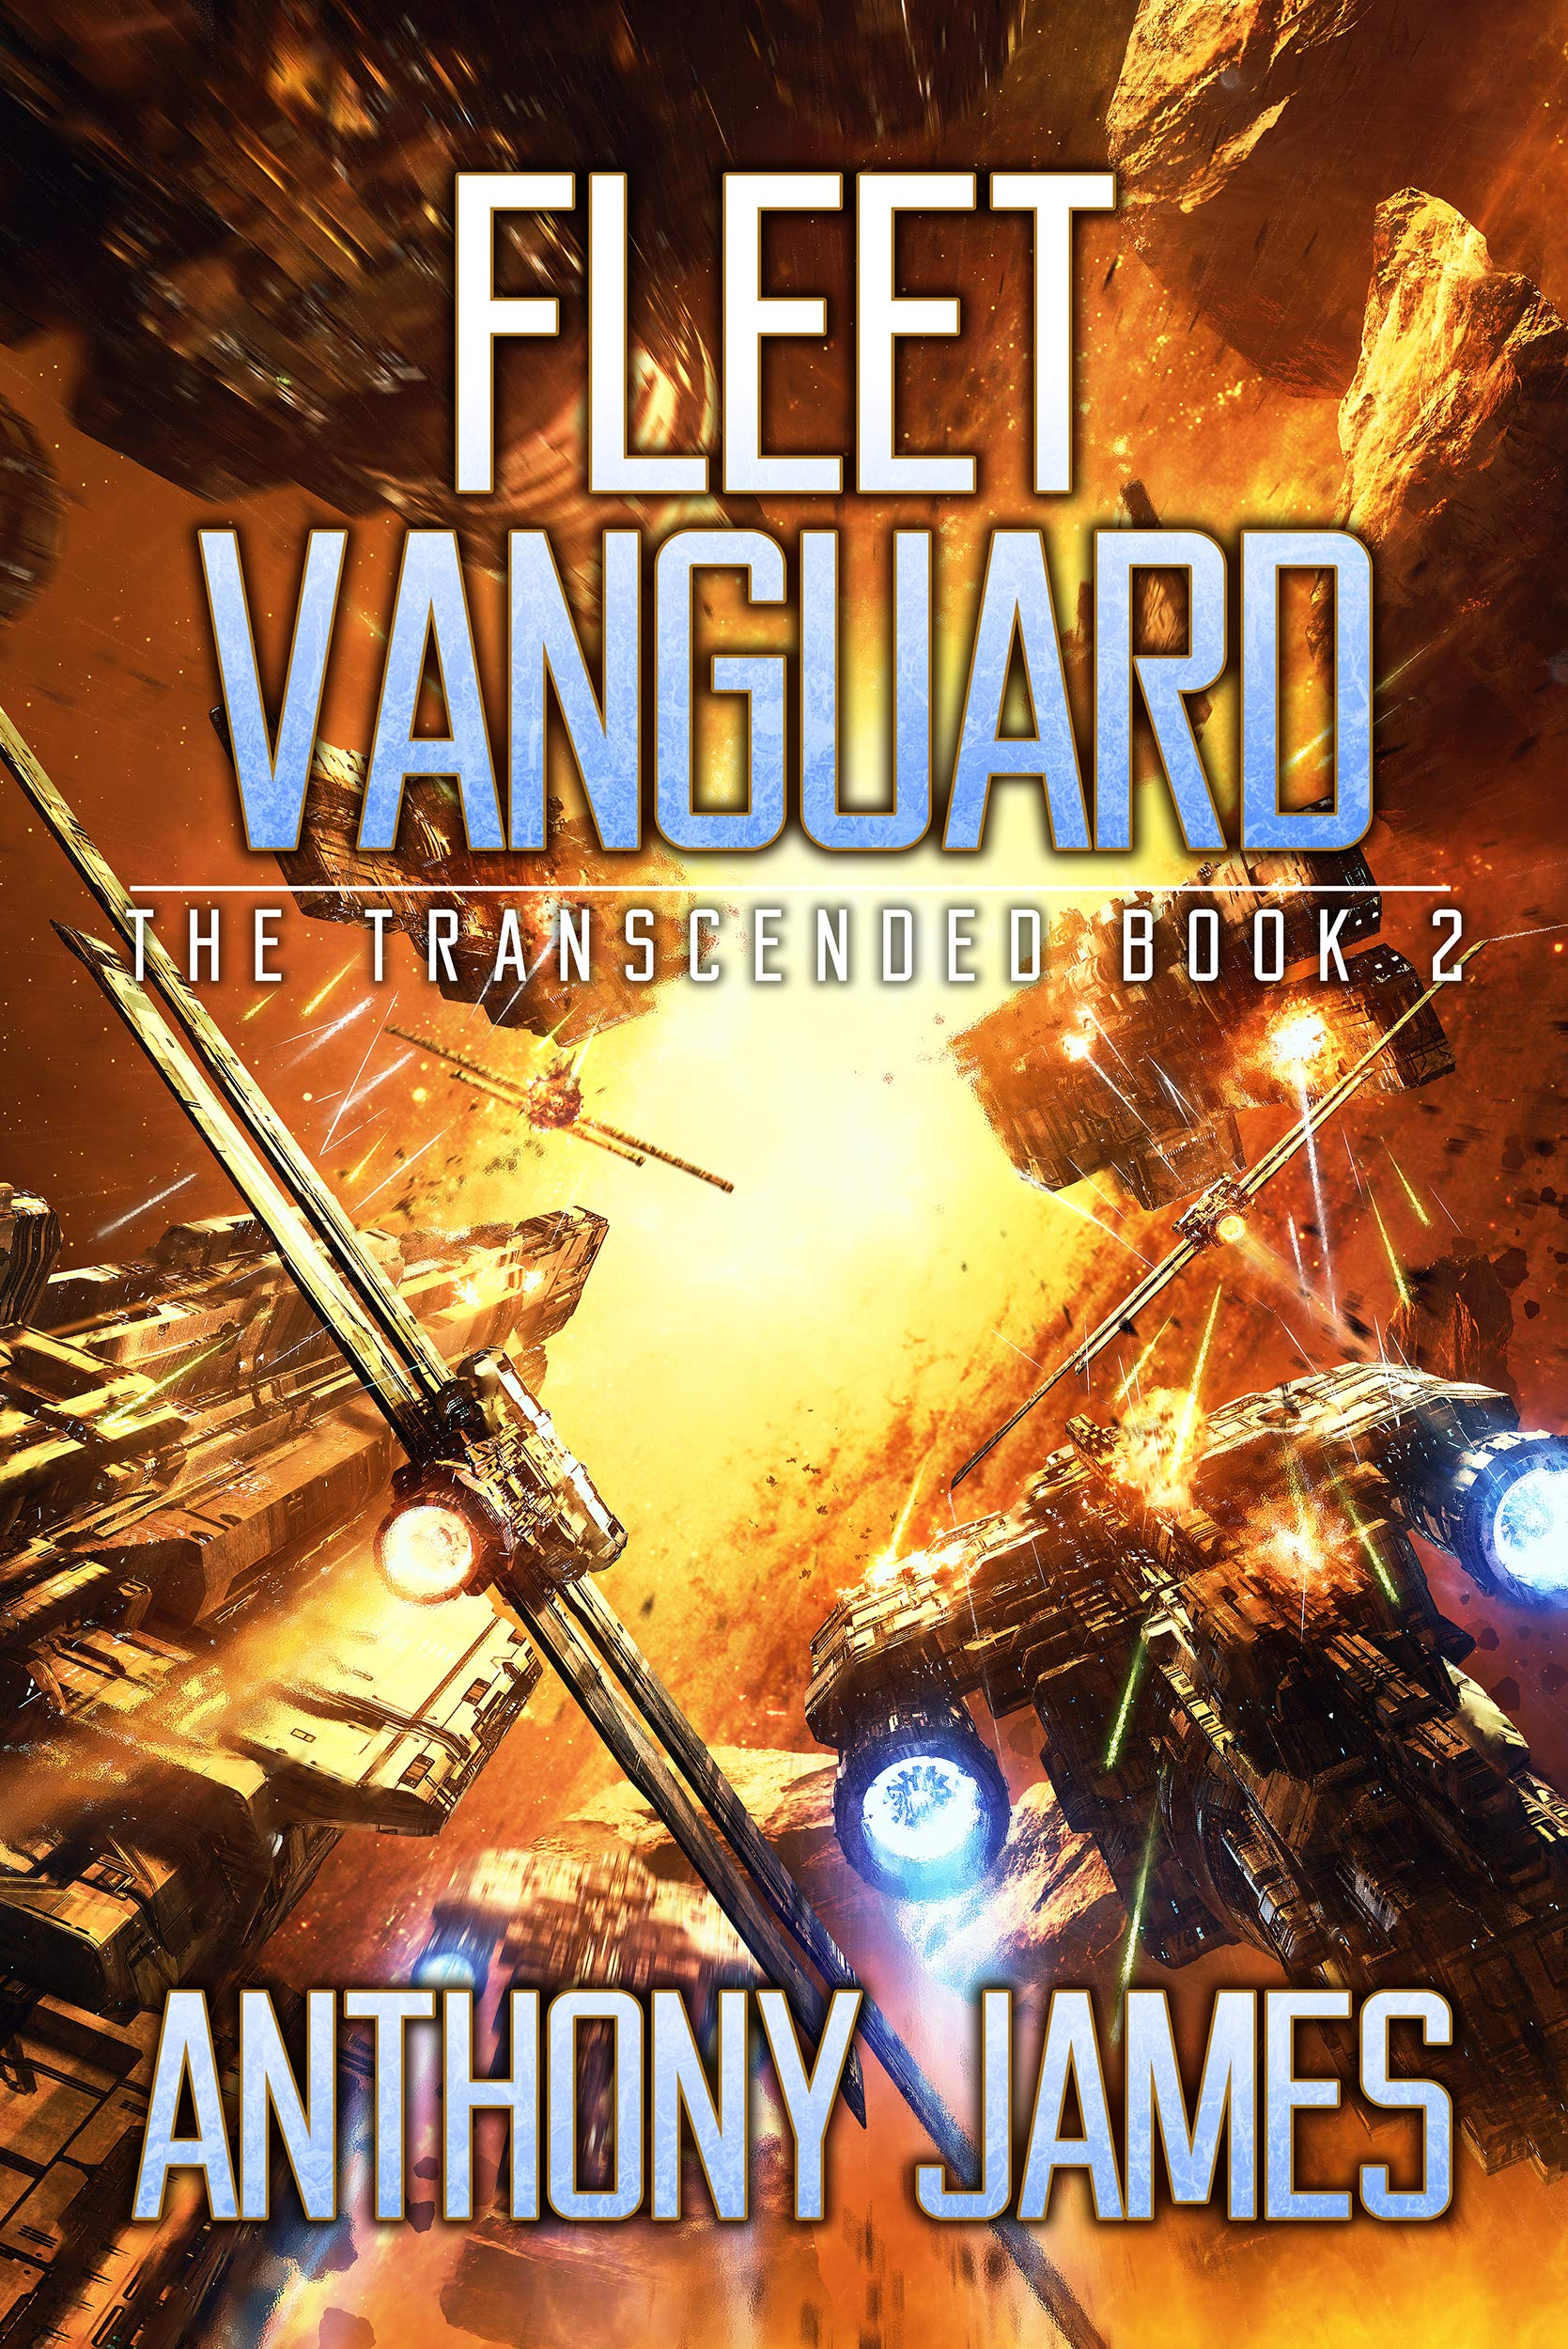 Fleet Vanguard (The Transcended Book 2) por Anthony James